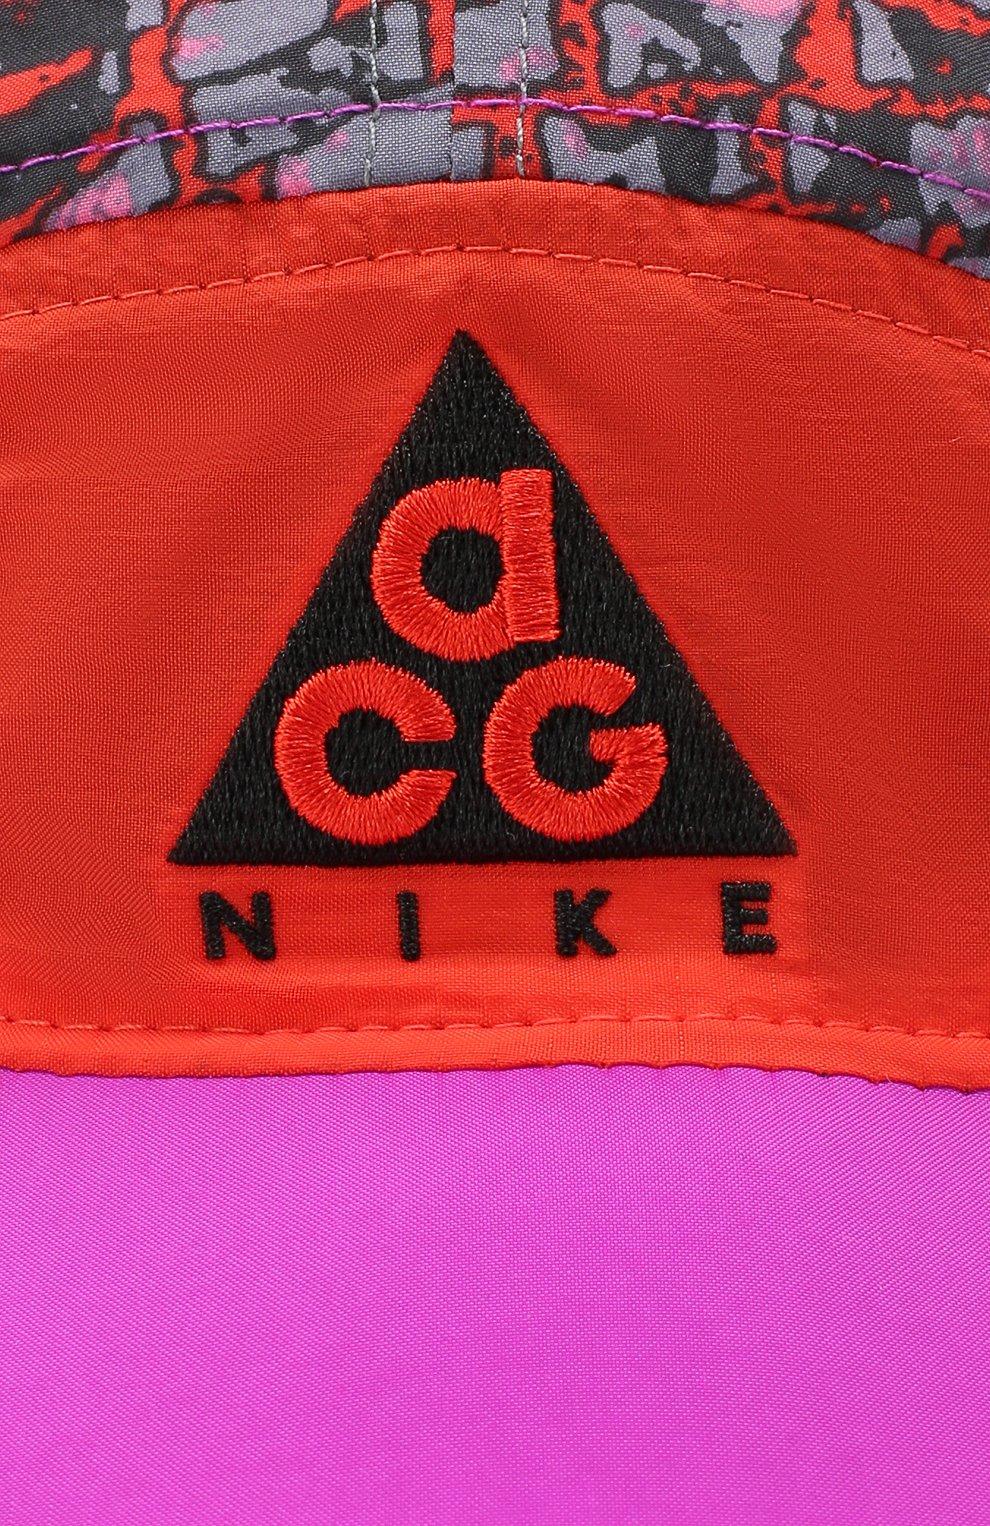 Мужской бейсболка nike acg tailwind NIKELAB разноцветного цвета, арт. BV1046-634 | Фото 3